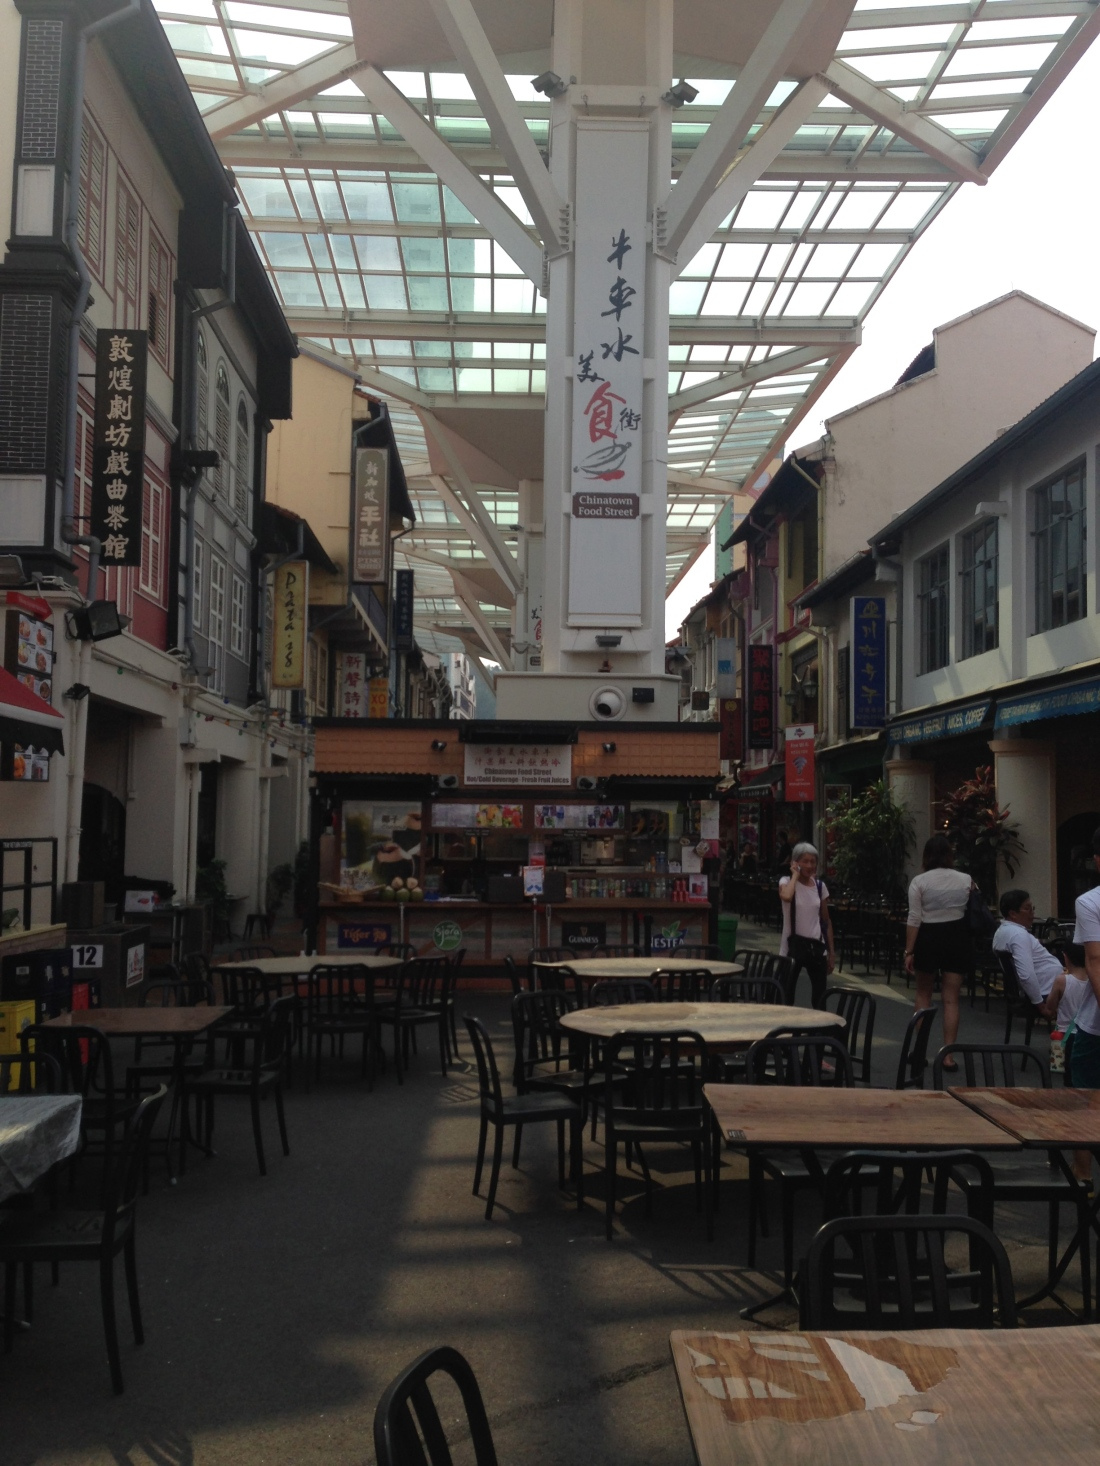 China town food market